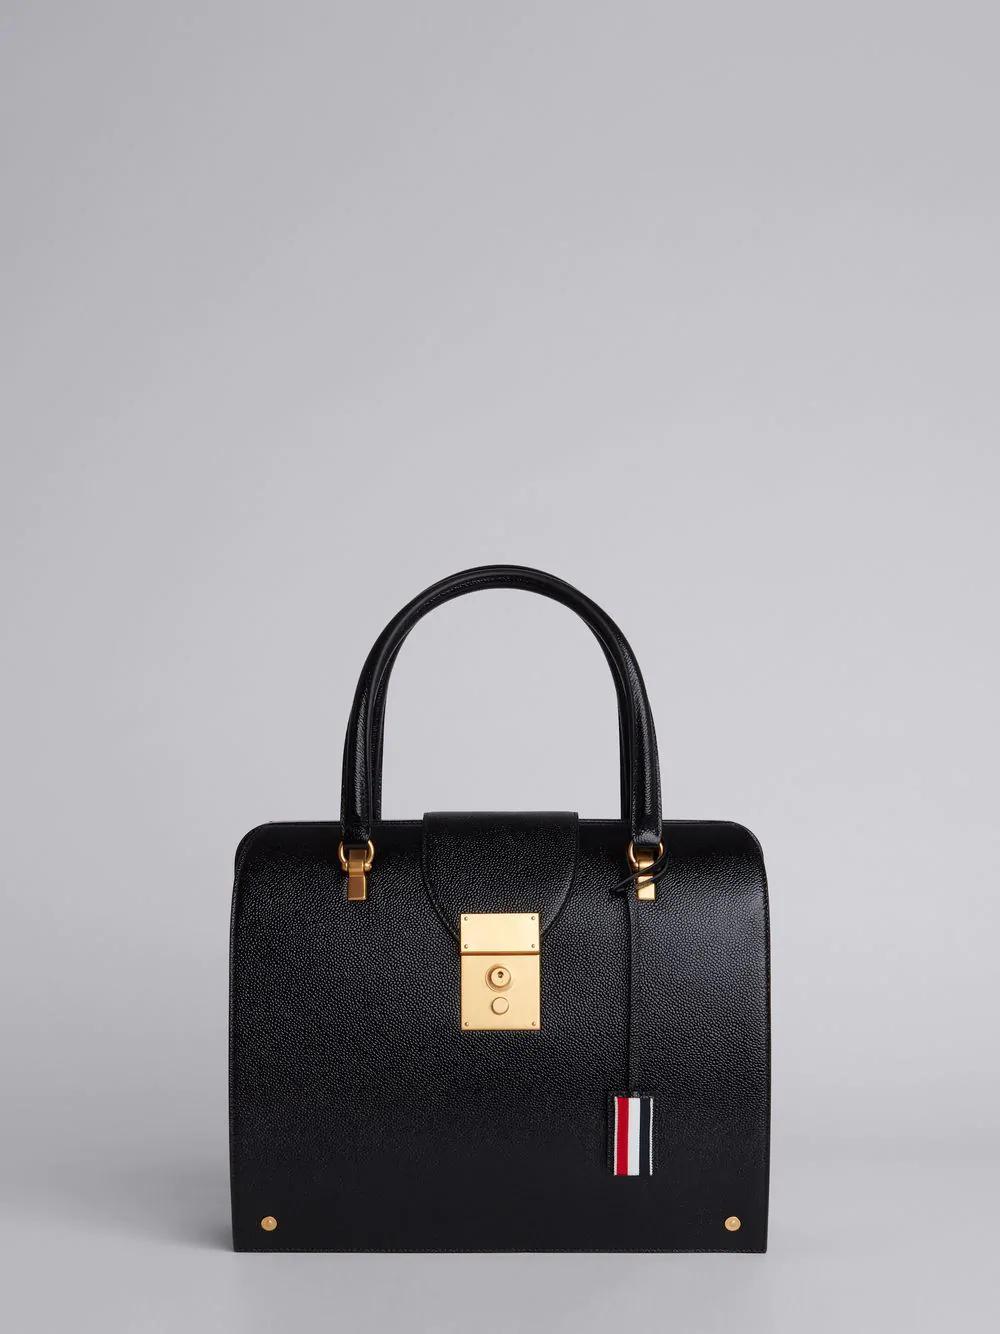 Thom Browne Mrs. Thom Lucido Leather Bag In Black